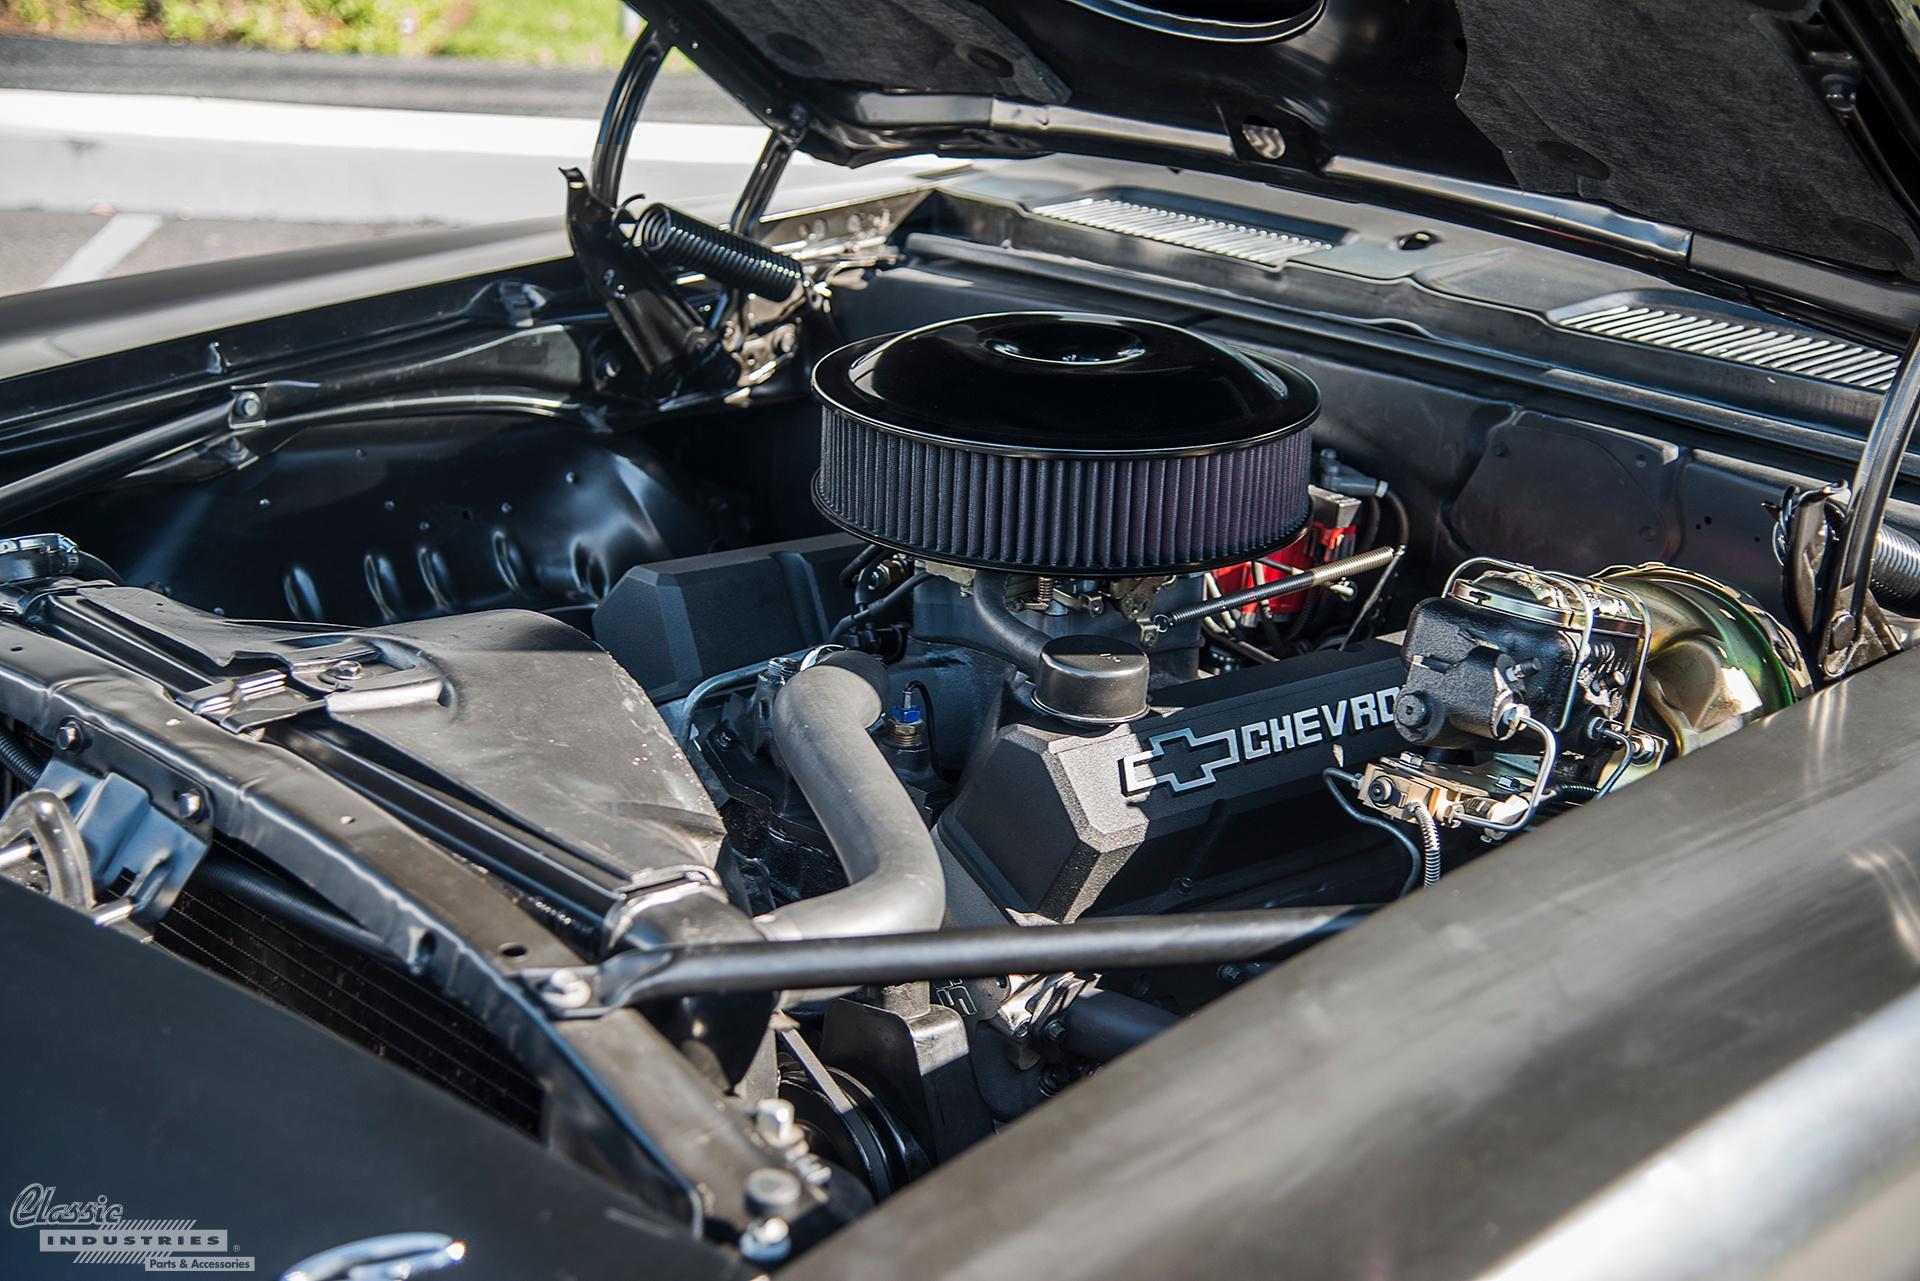 Project 69 Engine